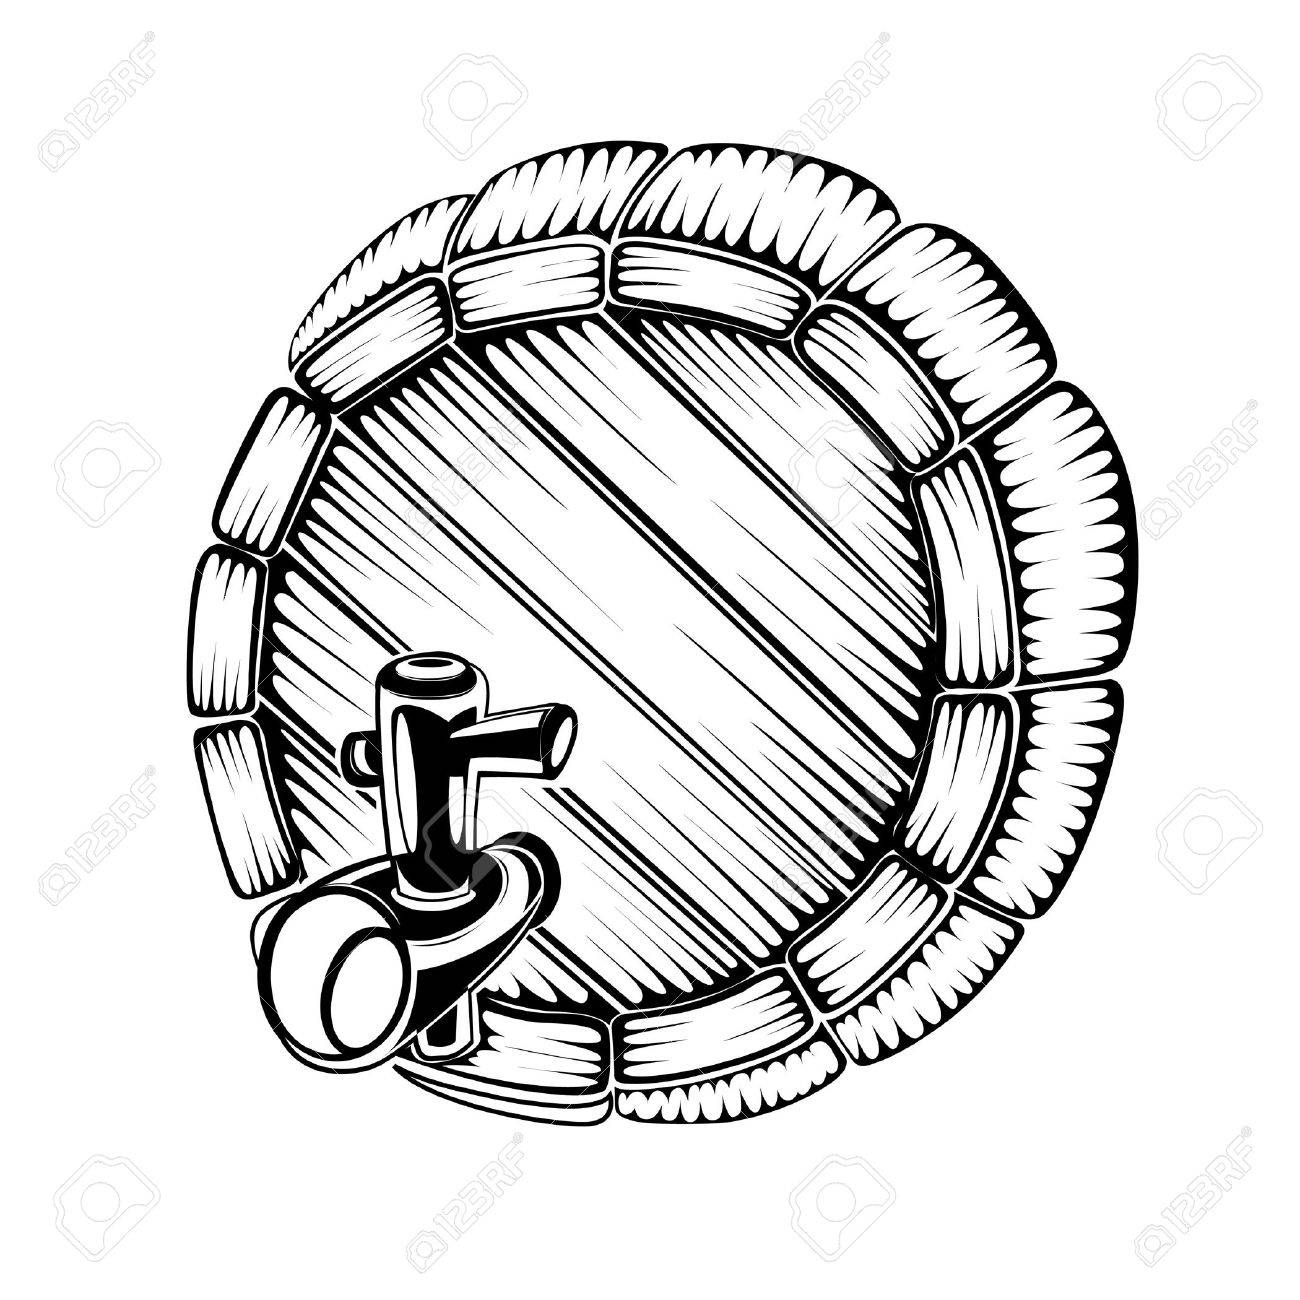 silhouette engraving of full face barrel - 18204034